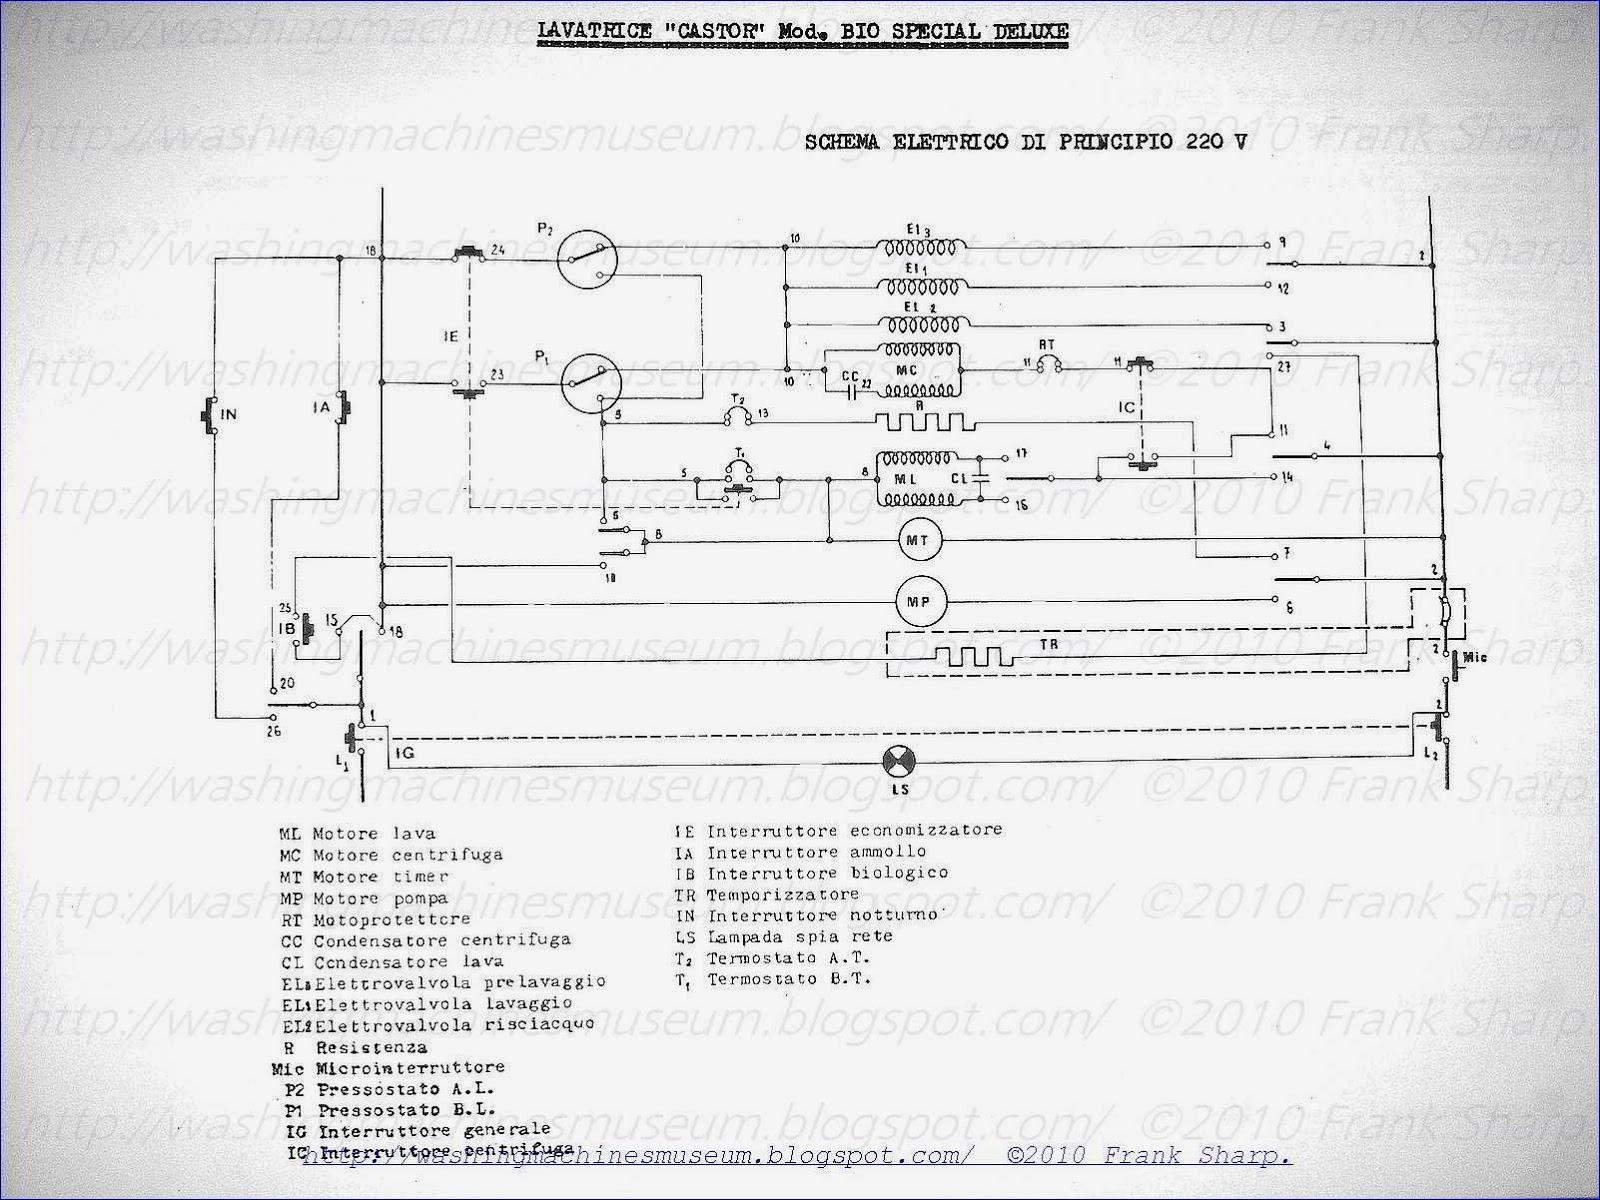 Washer Rama Museum   Castor Mod  Bio Special Deluxe Schematic Diagram